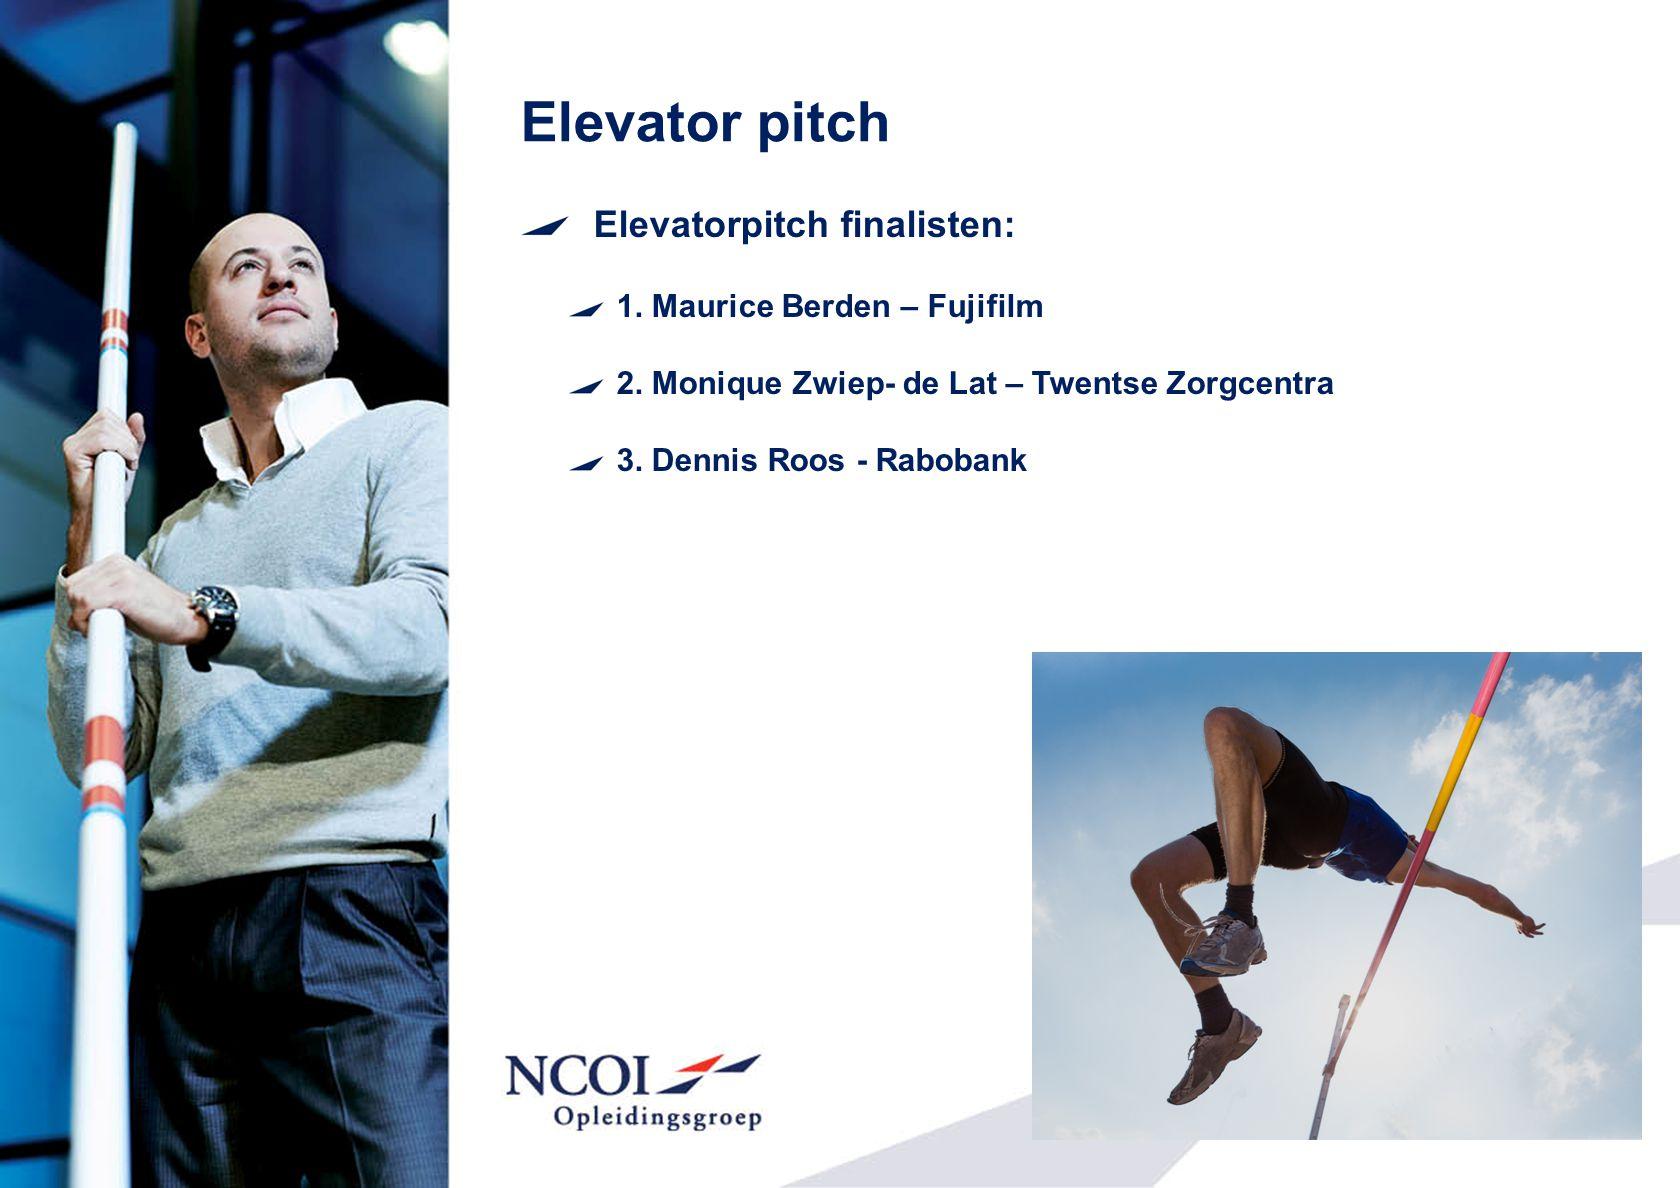 Elevator pitch Elevatorpitch finalisten: 1. Maurice Berden – Fujifilm 2. Monique Zwiep- de Lat – Twentse Zorgcentra 3. Dennis Roos - Rabobank